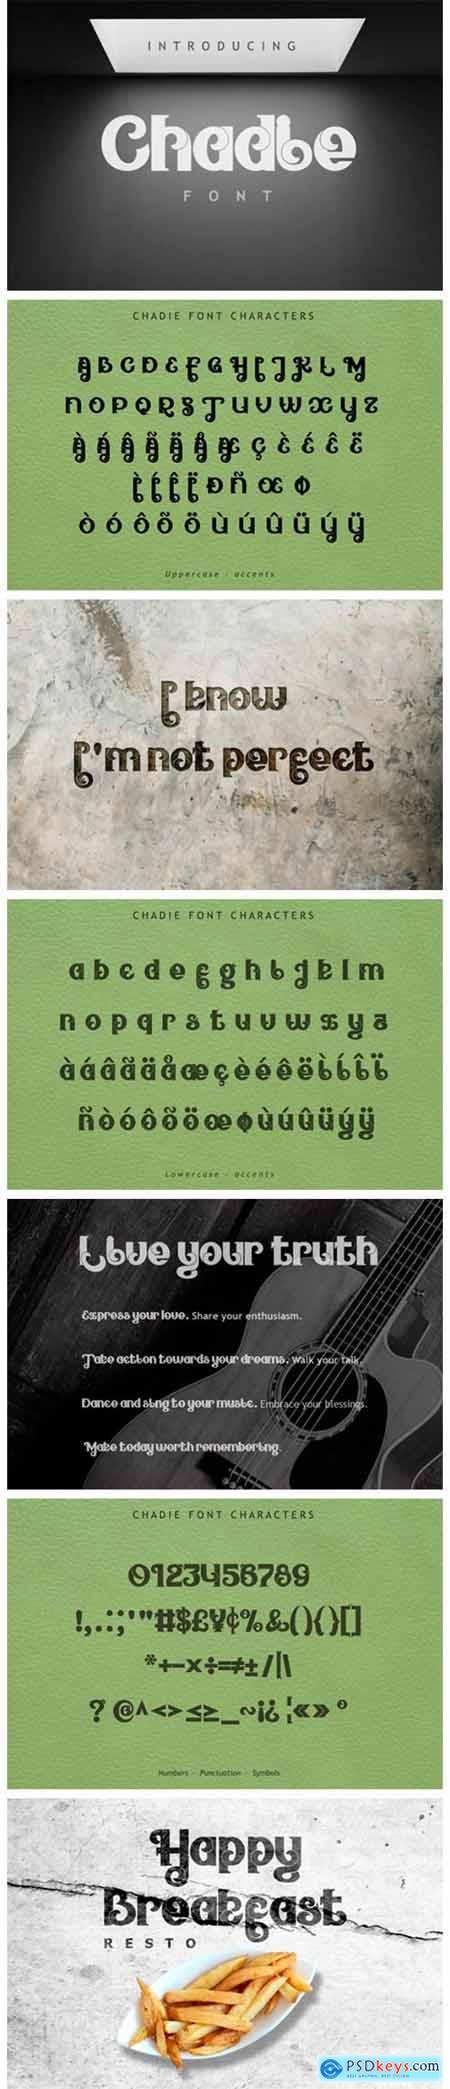 Chadie Font